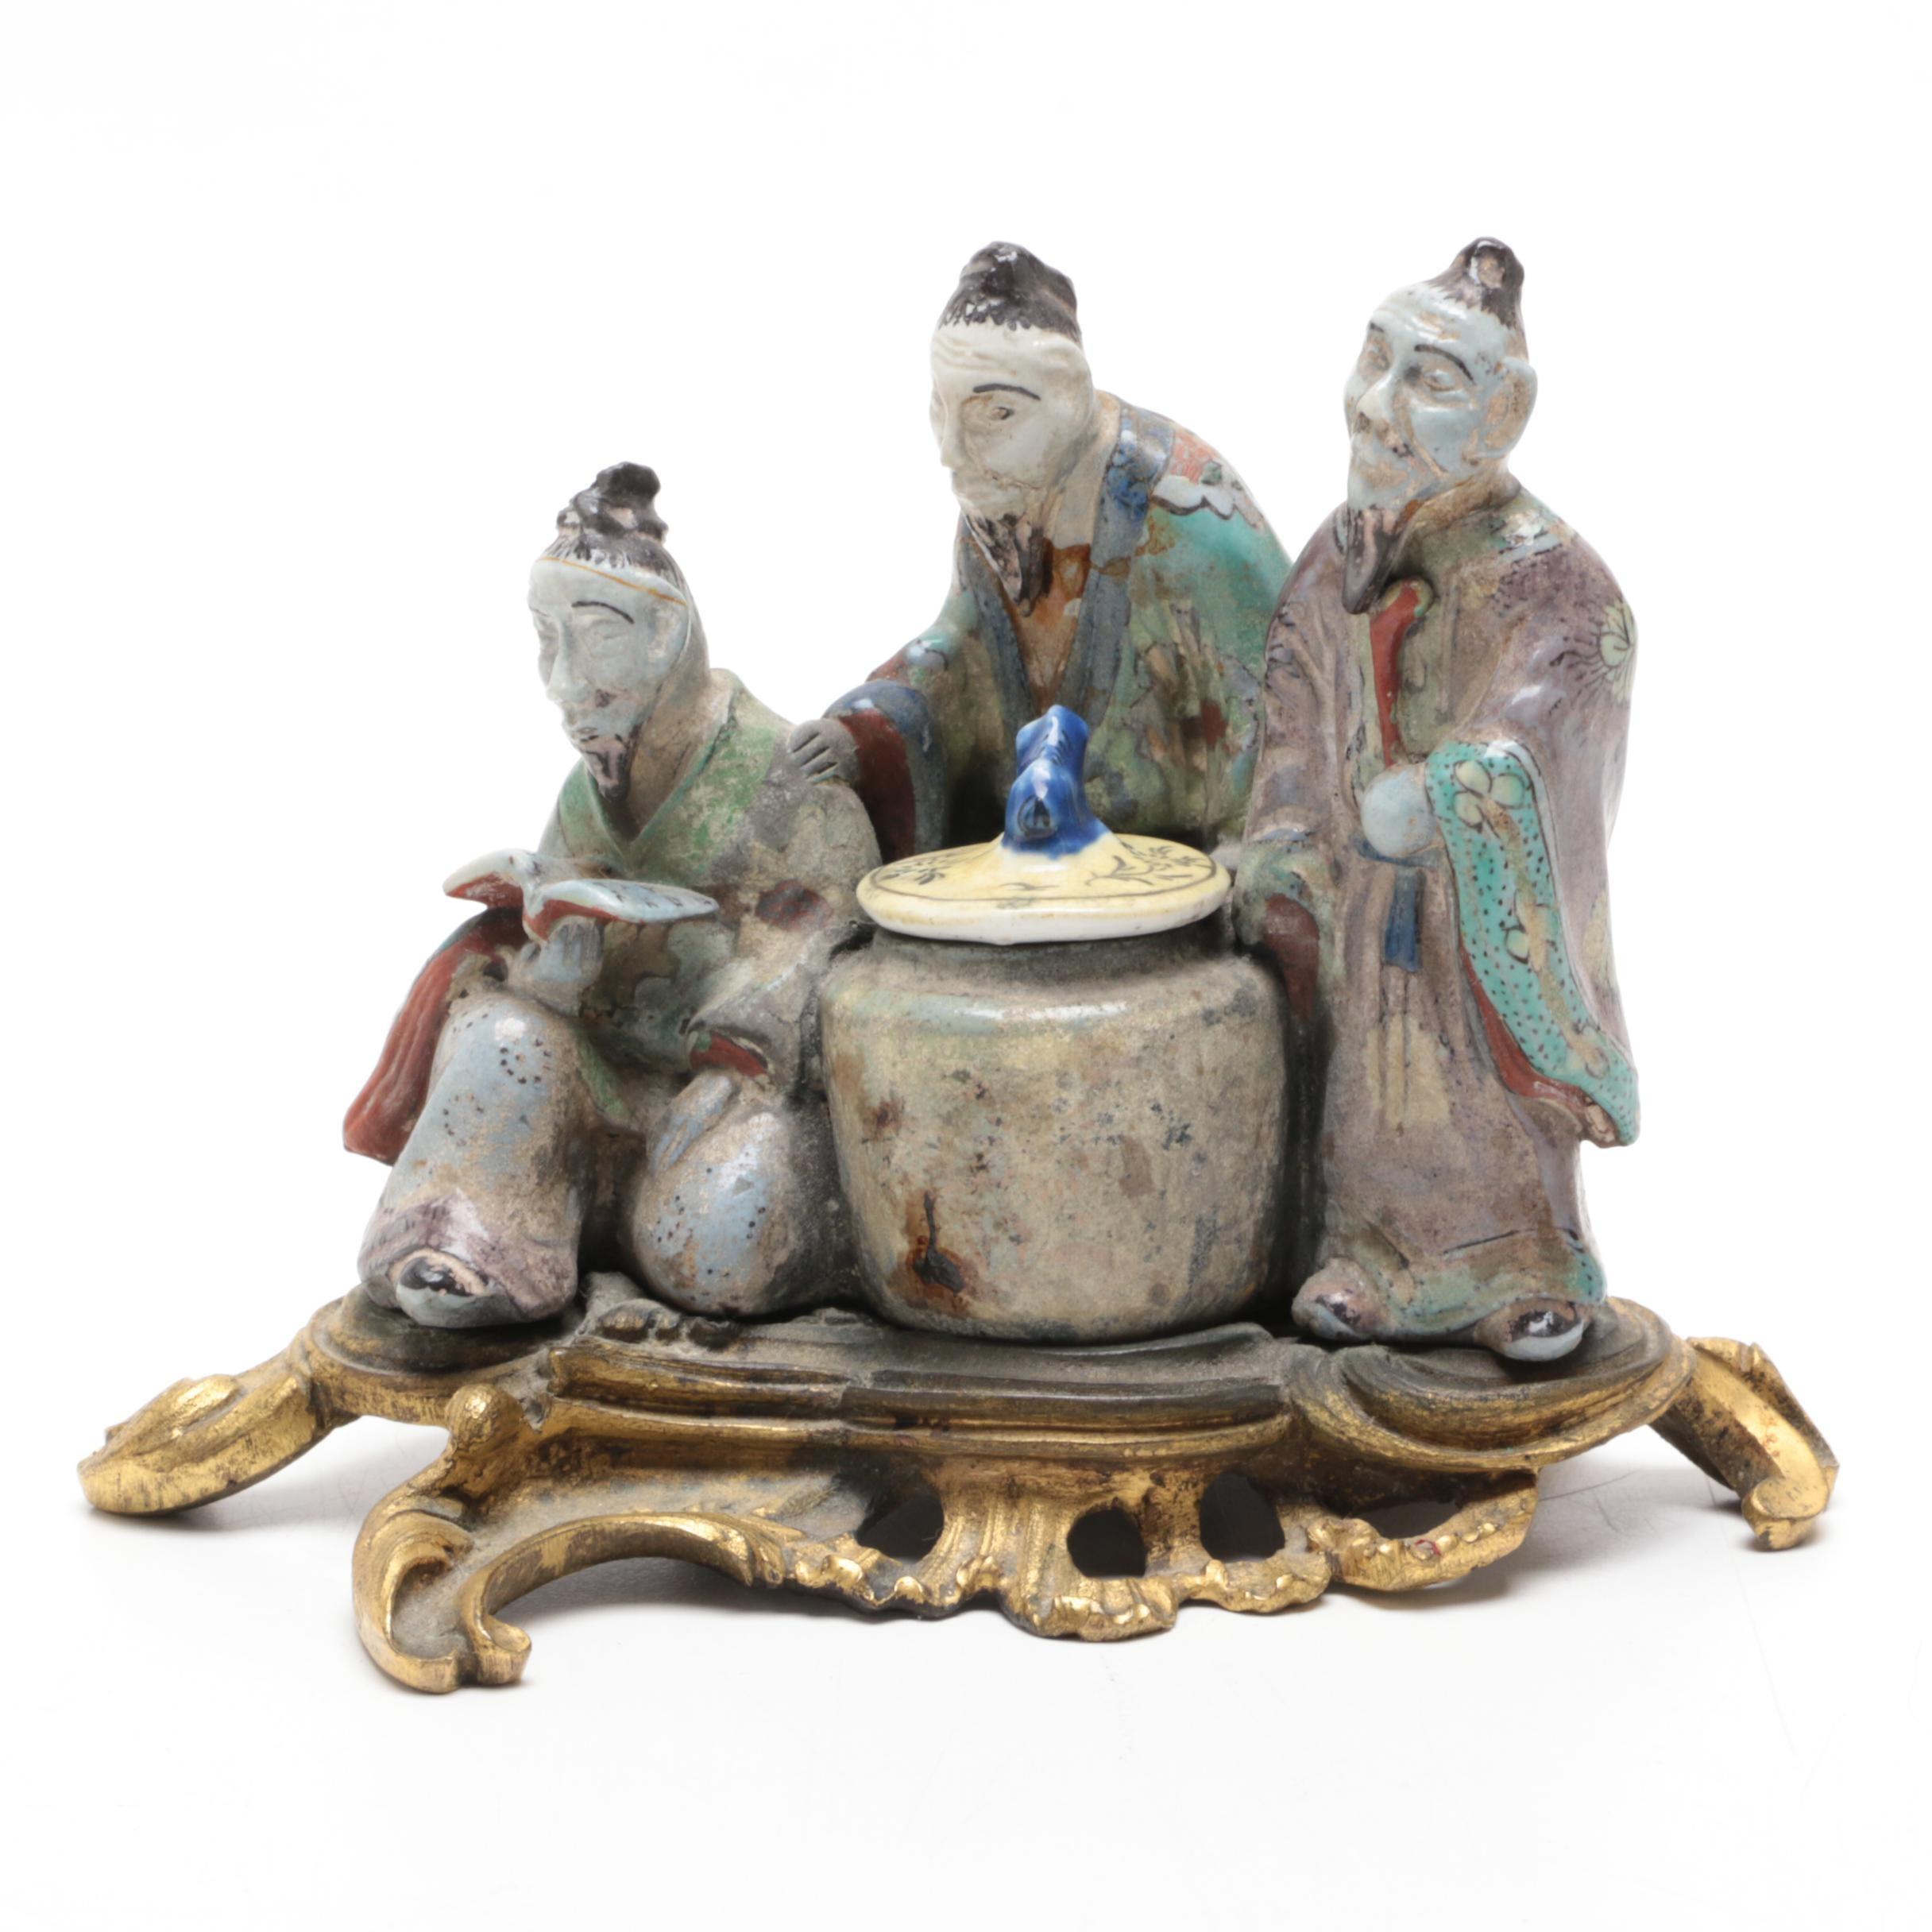 Chinese Ceramic Figurine with Brass Stand